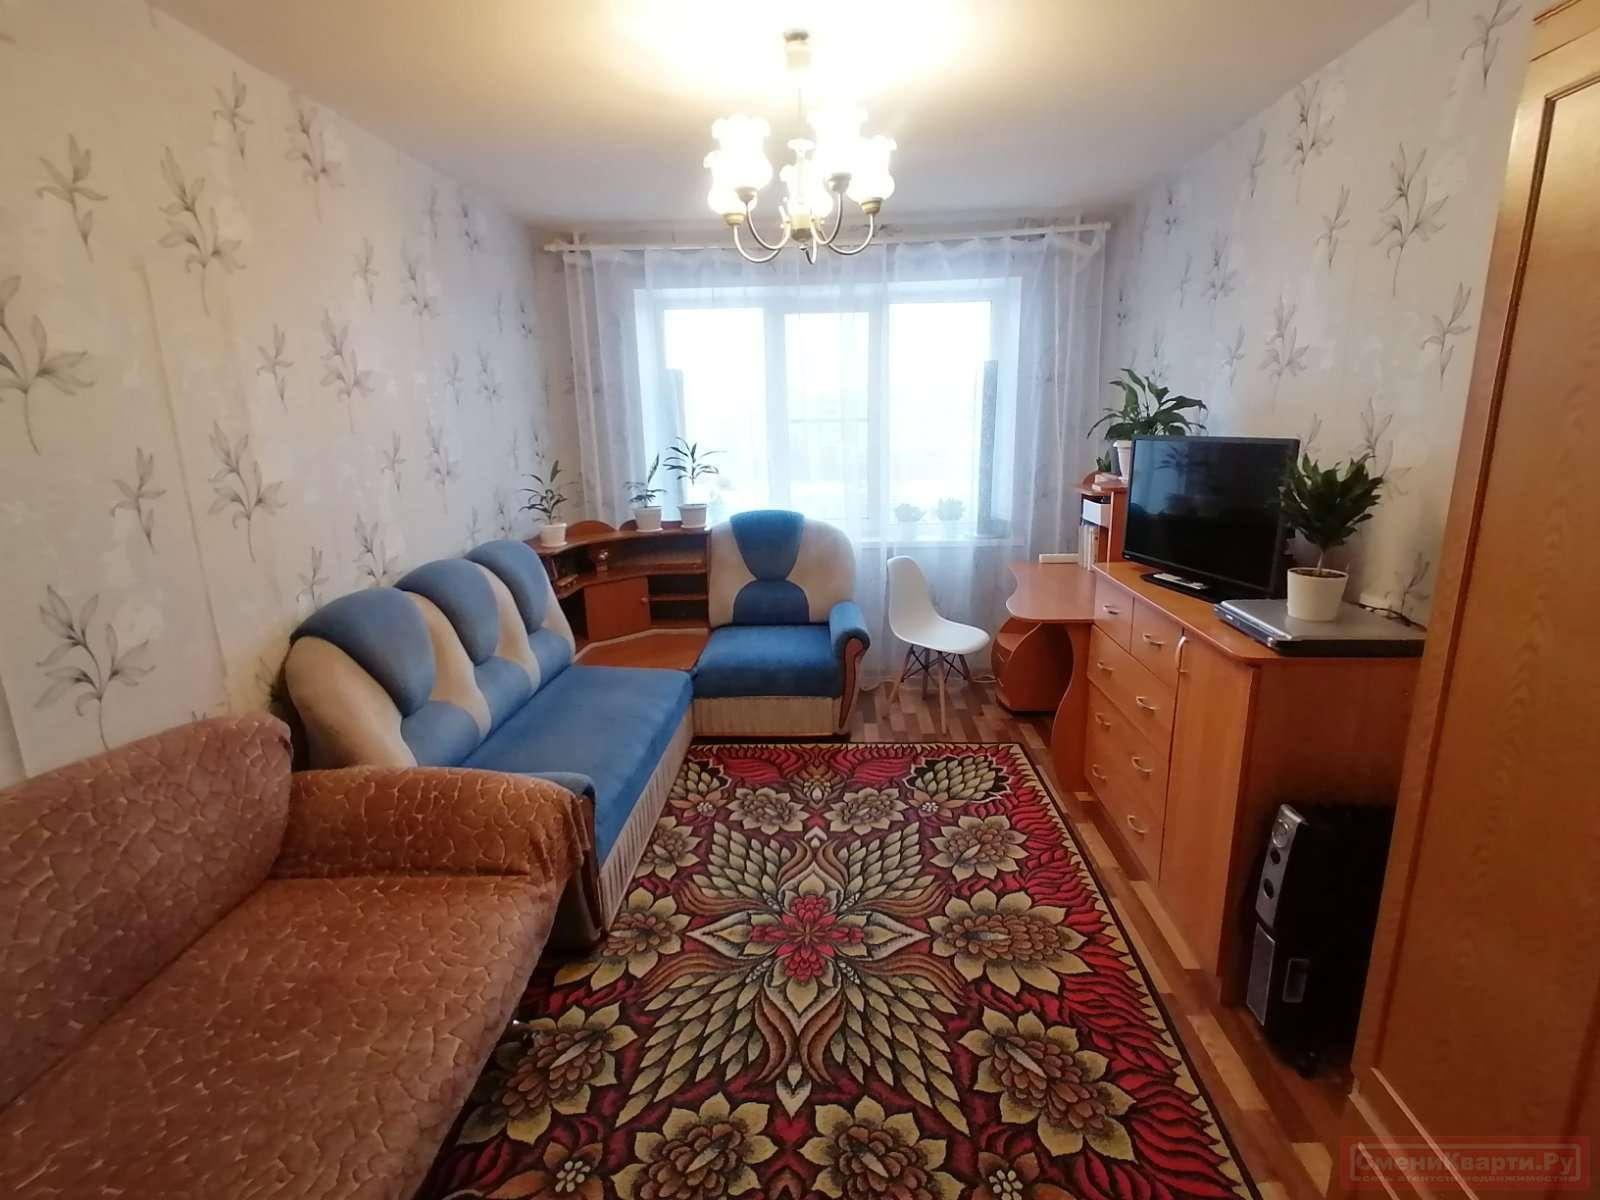 Продажа комнаты, г. Тольятти, Луначарского бульвар  дом 4